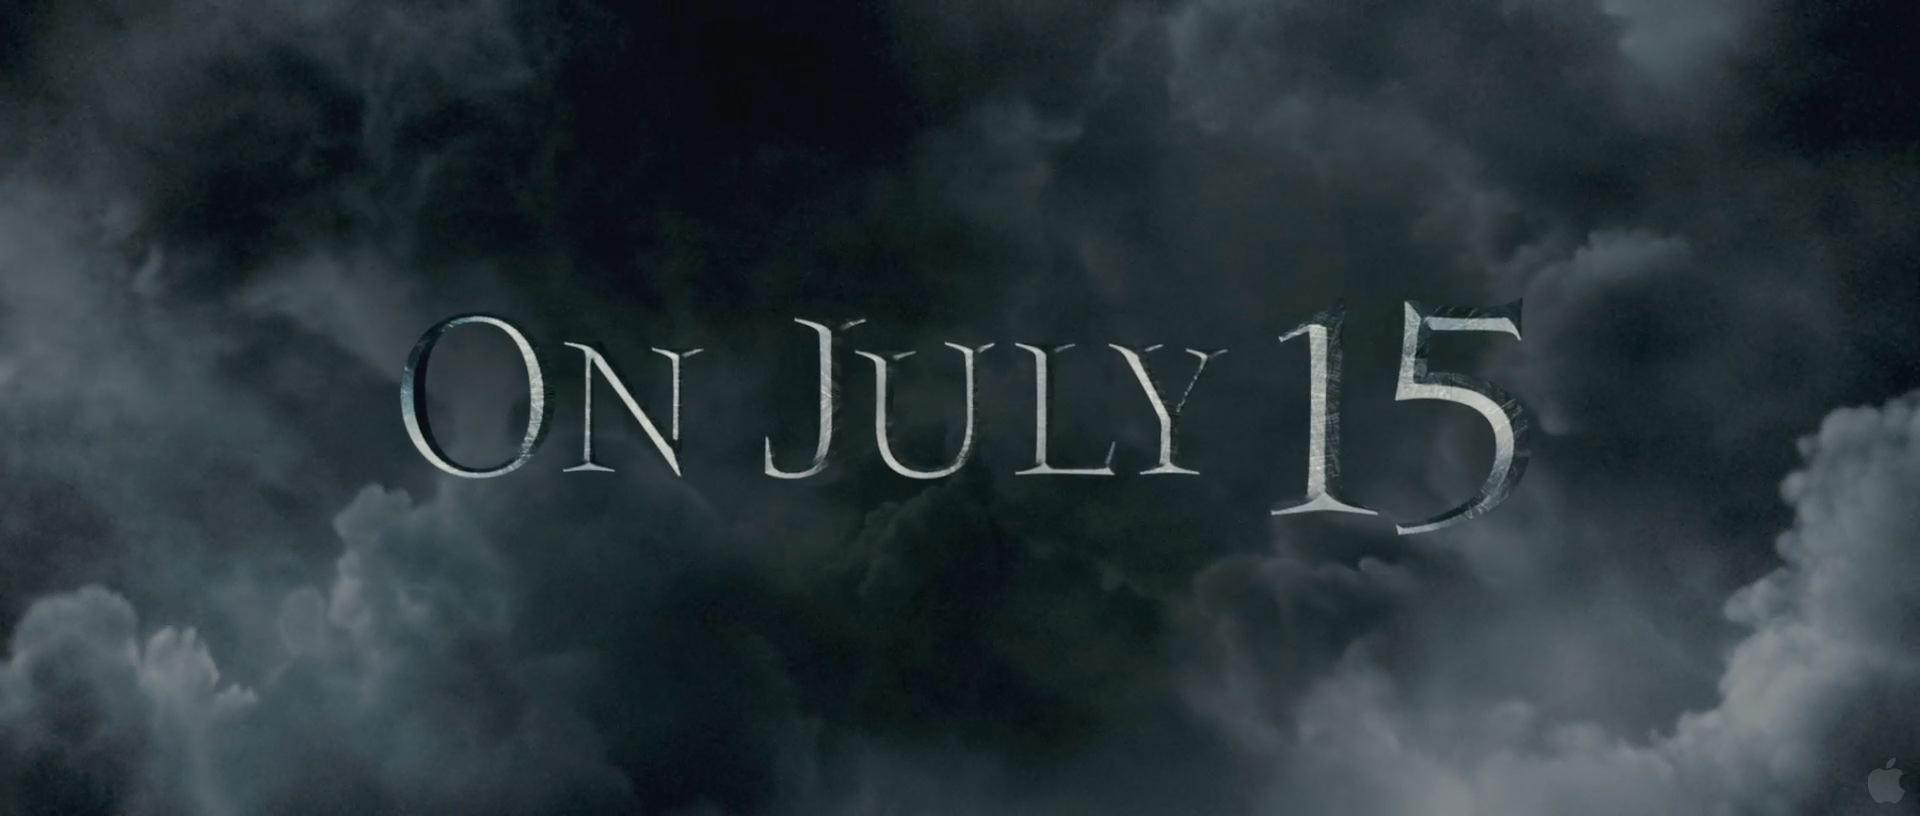 Harry Potter BlogHogwarts HP7 2 Trailer 25